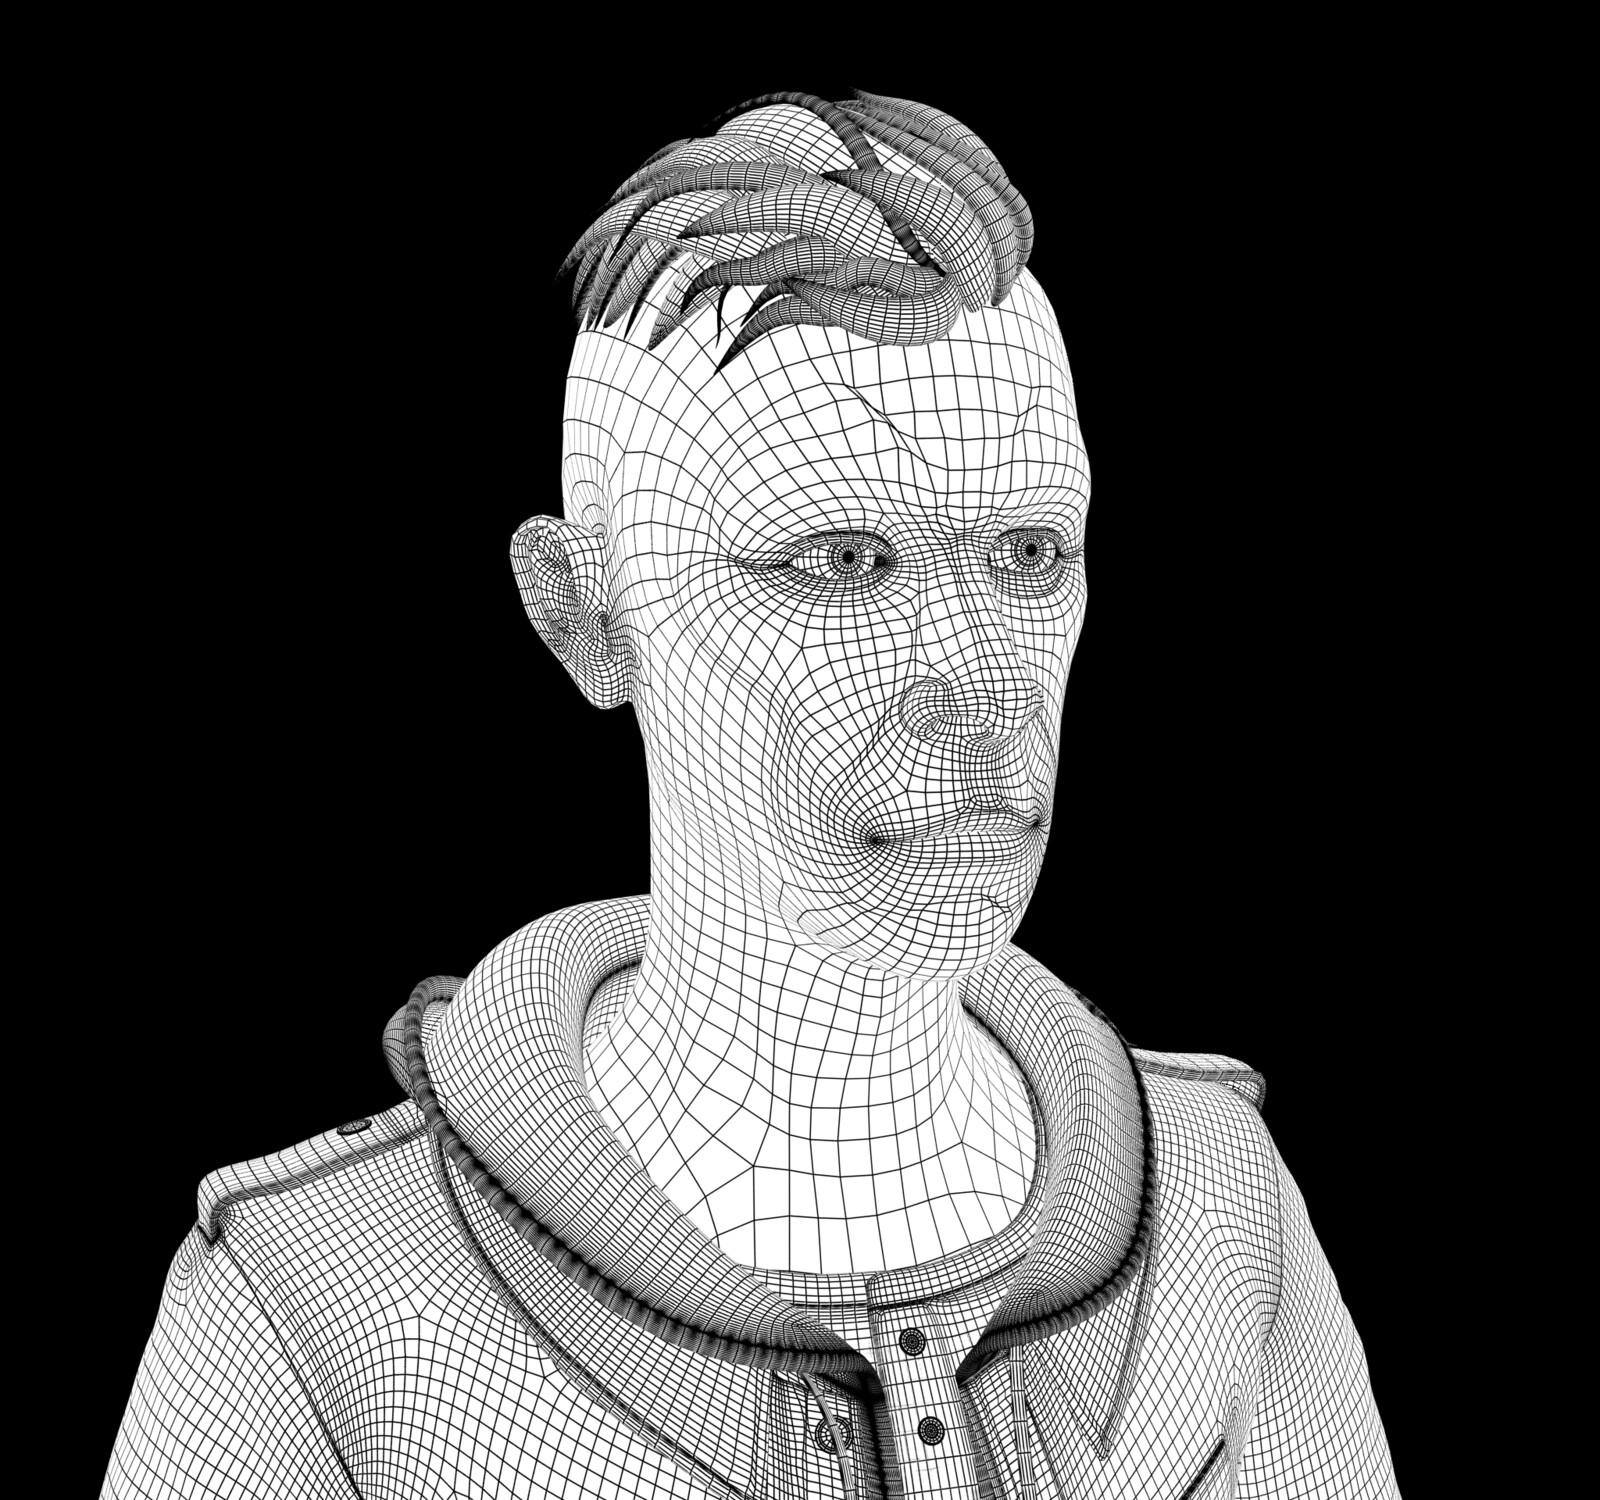 Low-res Wireframe (always creepy looking honestly)